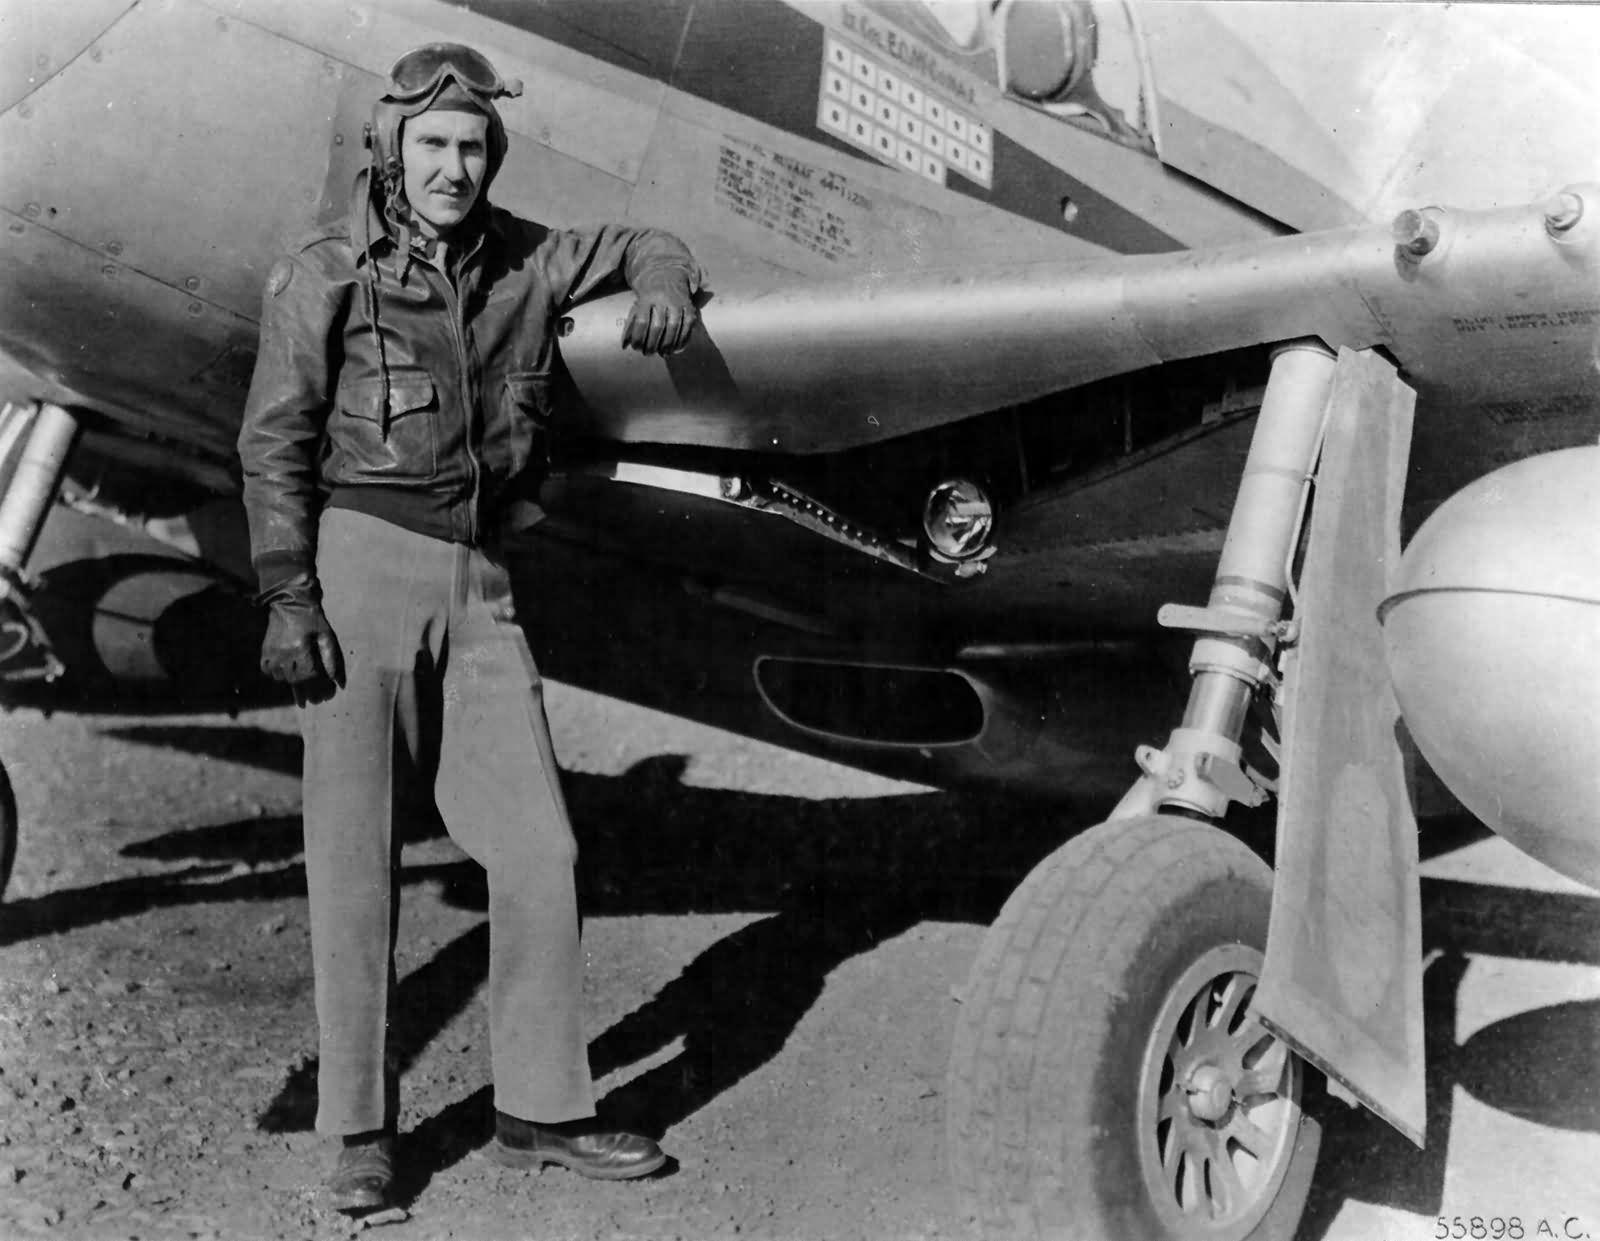 P-51D_44-11280_Pilot_Lt_Col_Edward_Mccomas_of_the_118th_Trs_23rd_FG.jpg 1,600×1,241 pixels